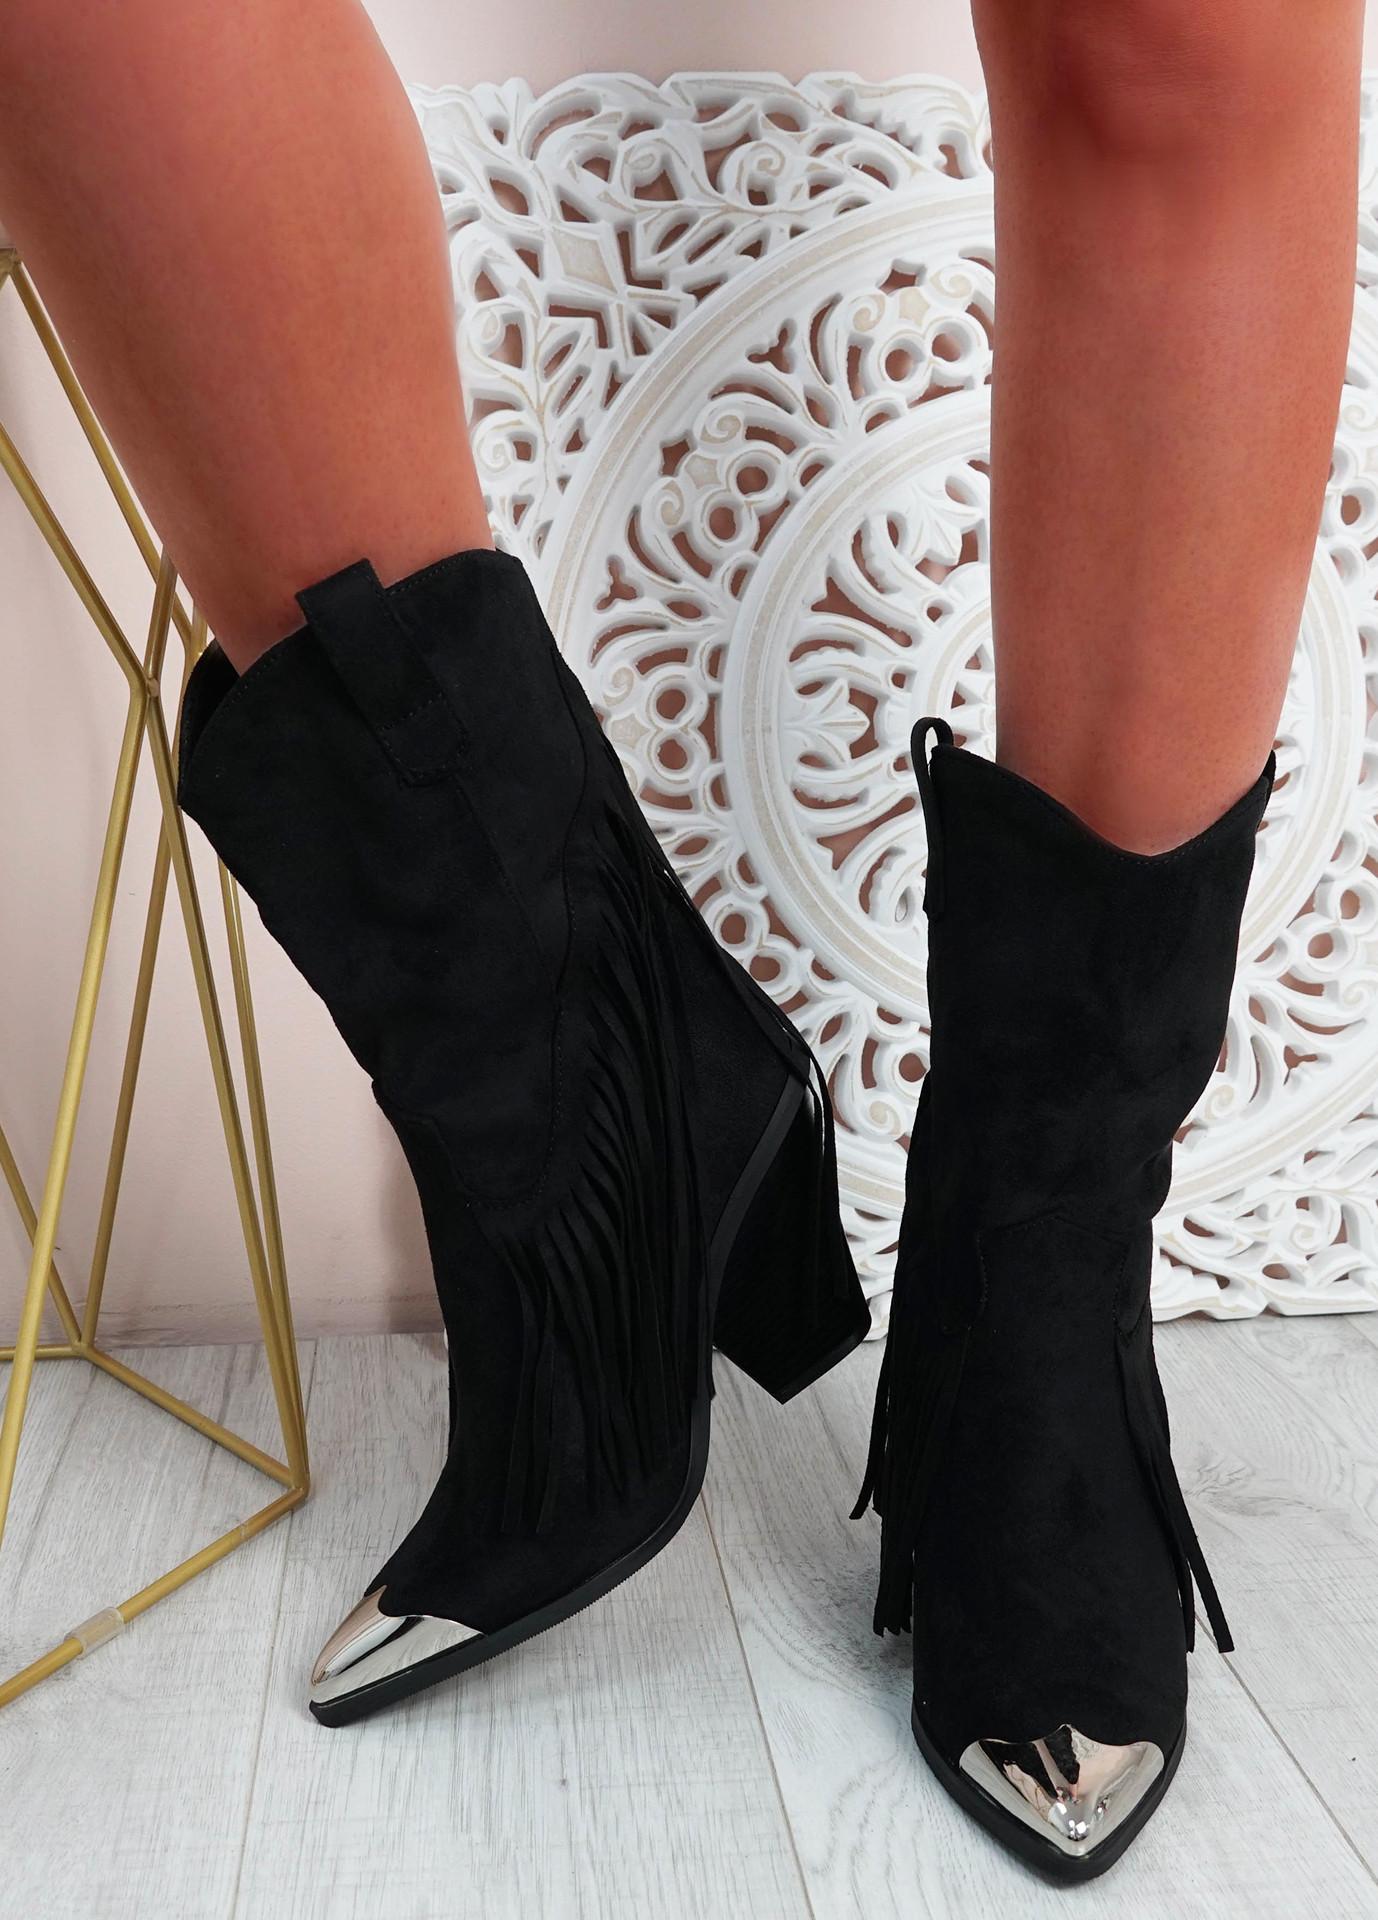 Chana Black Suede Fringe Mid Calf Boots